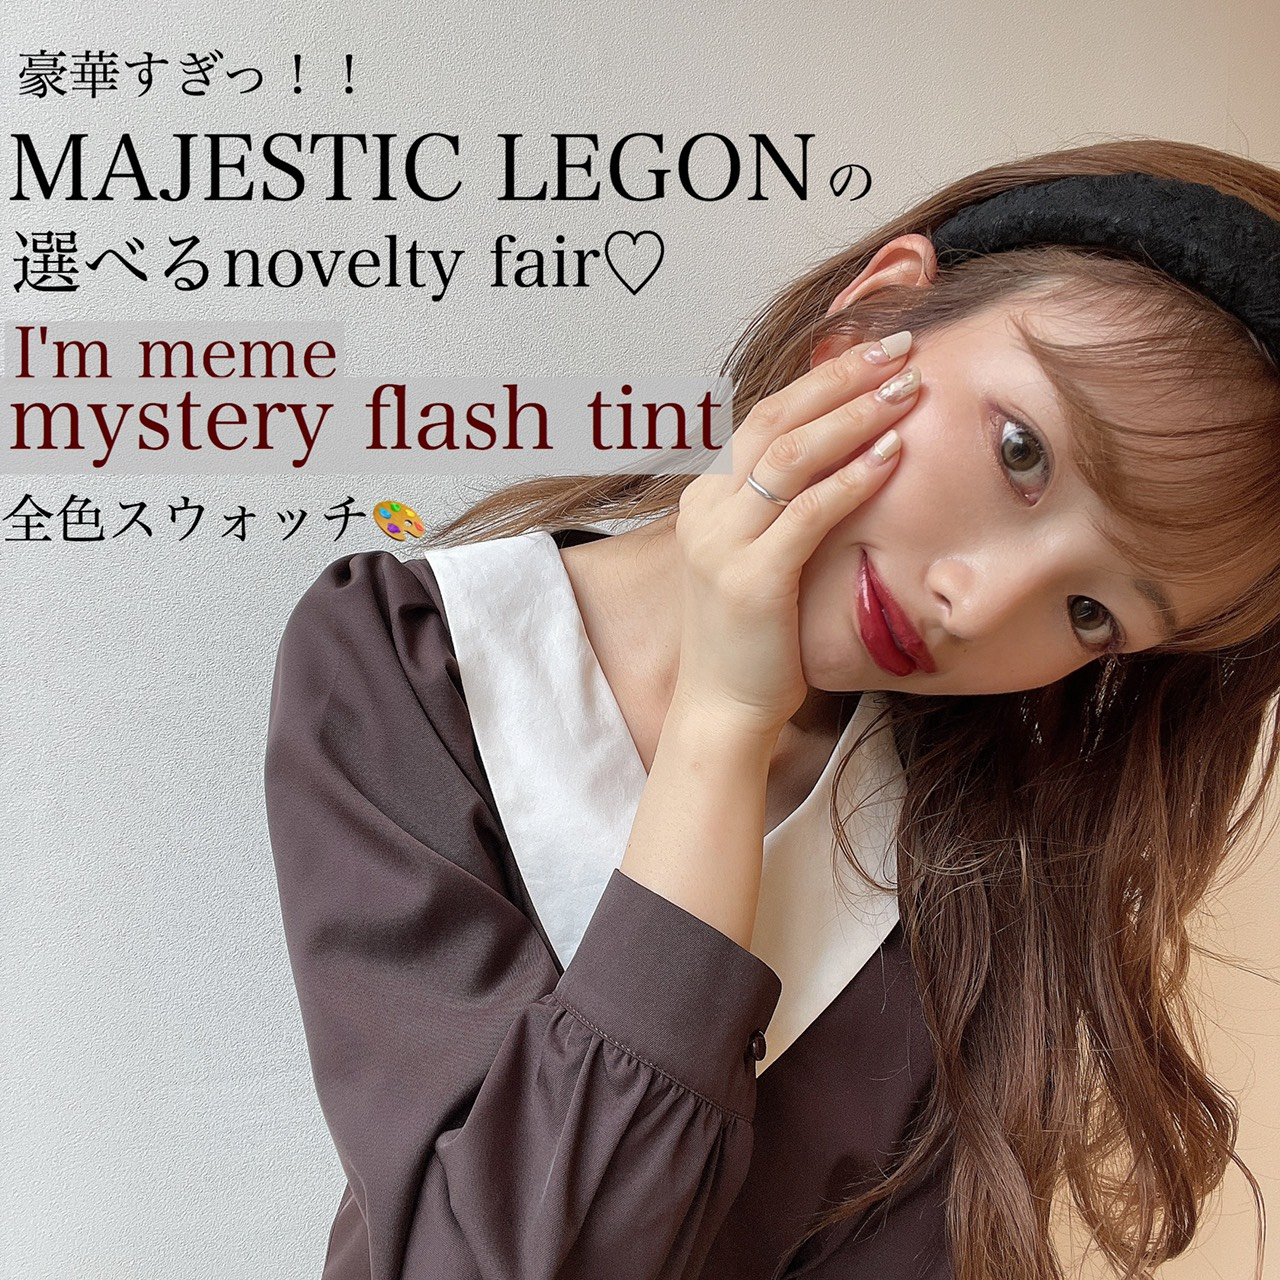 【Novelty fair】豪華すぎる!9/17~I'M MEMEのティントがもらえちゃう♡